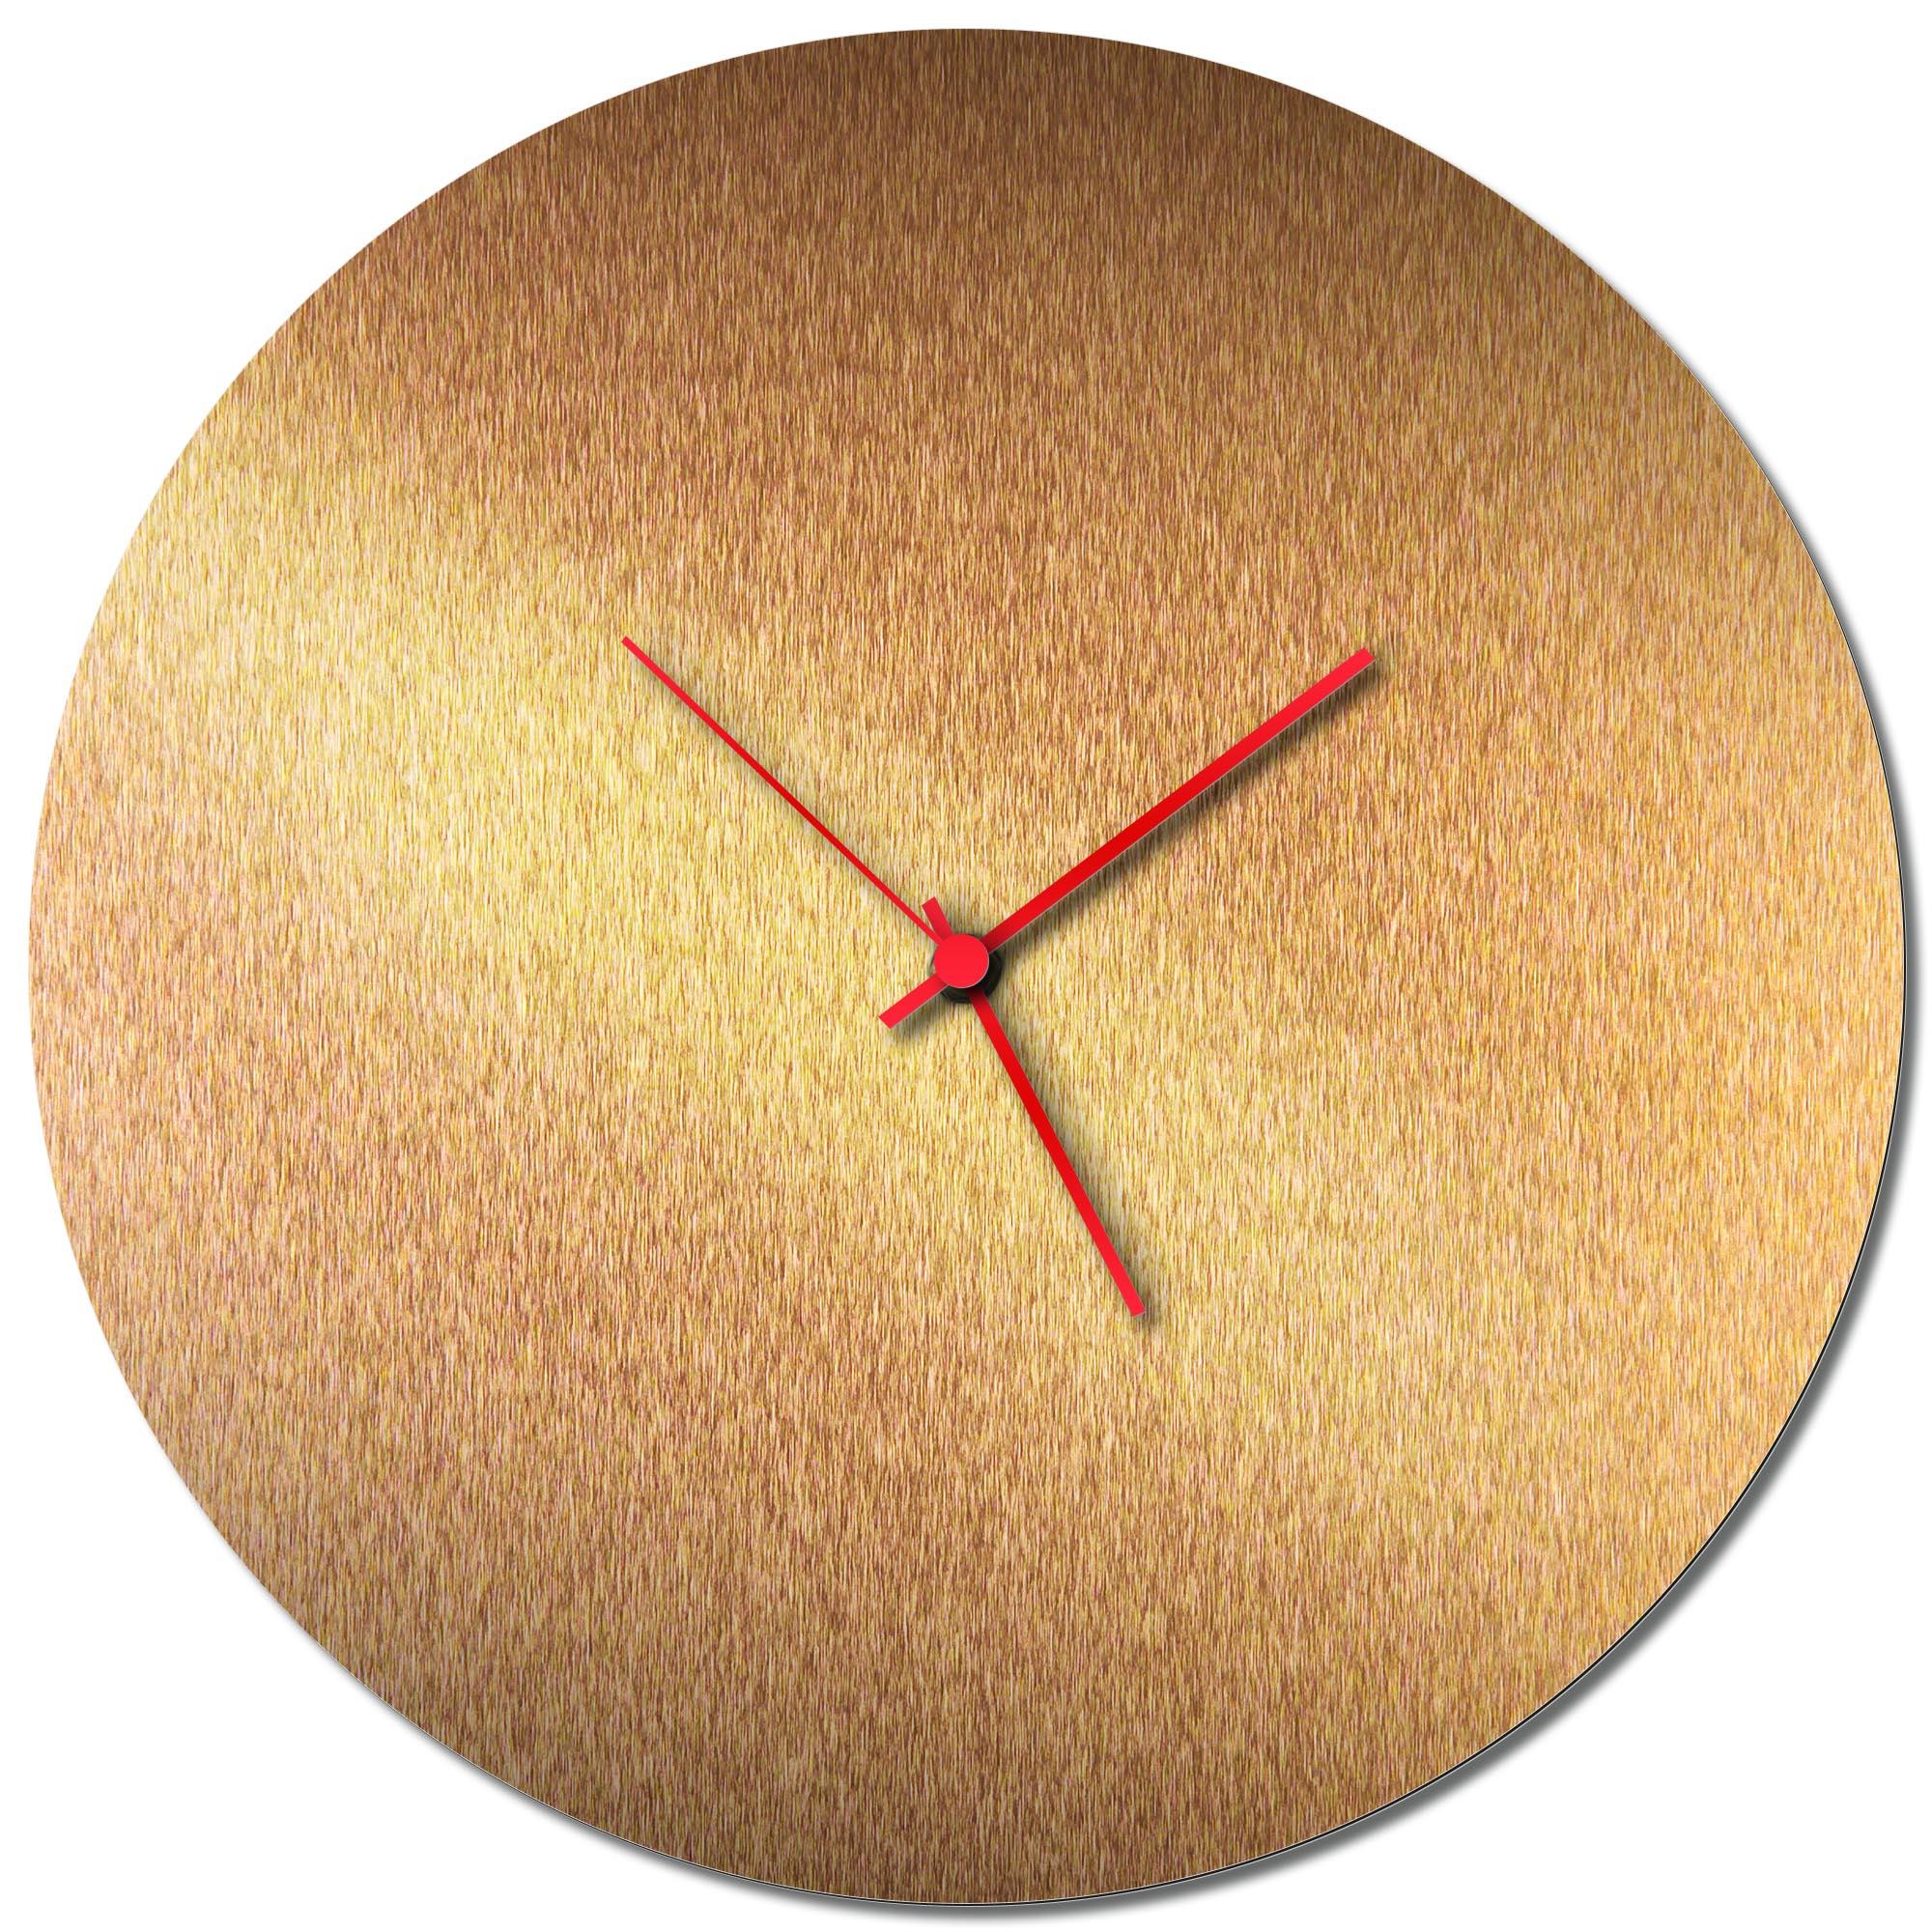 Adam Schwoeppe 'Bronzesmith Circle Clock Red' Midcentury Modern Style Wall Clock